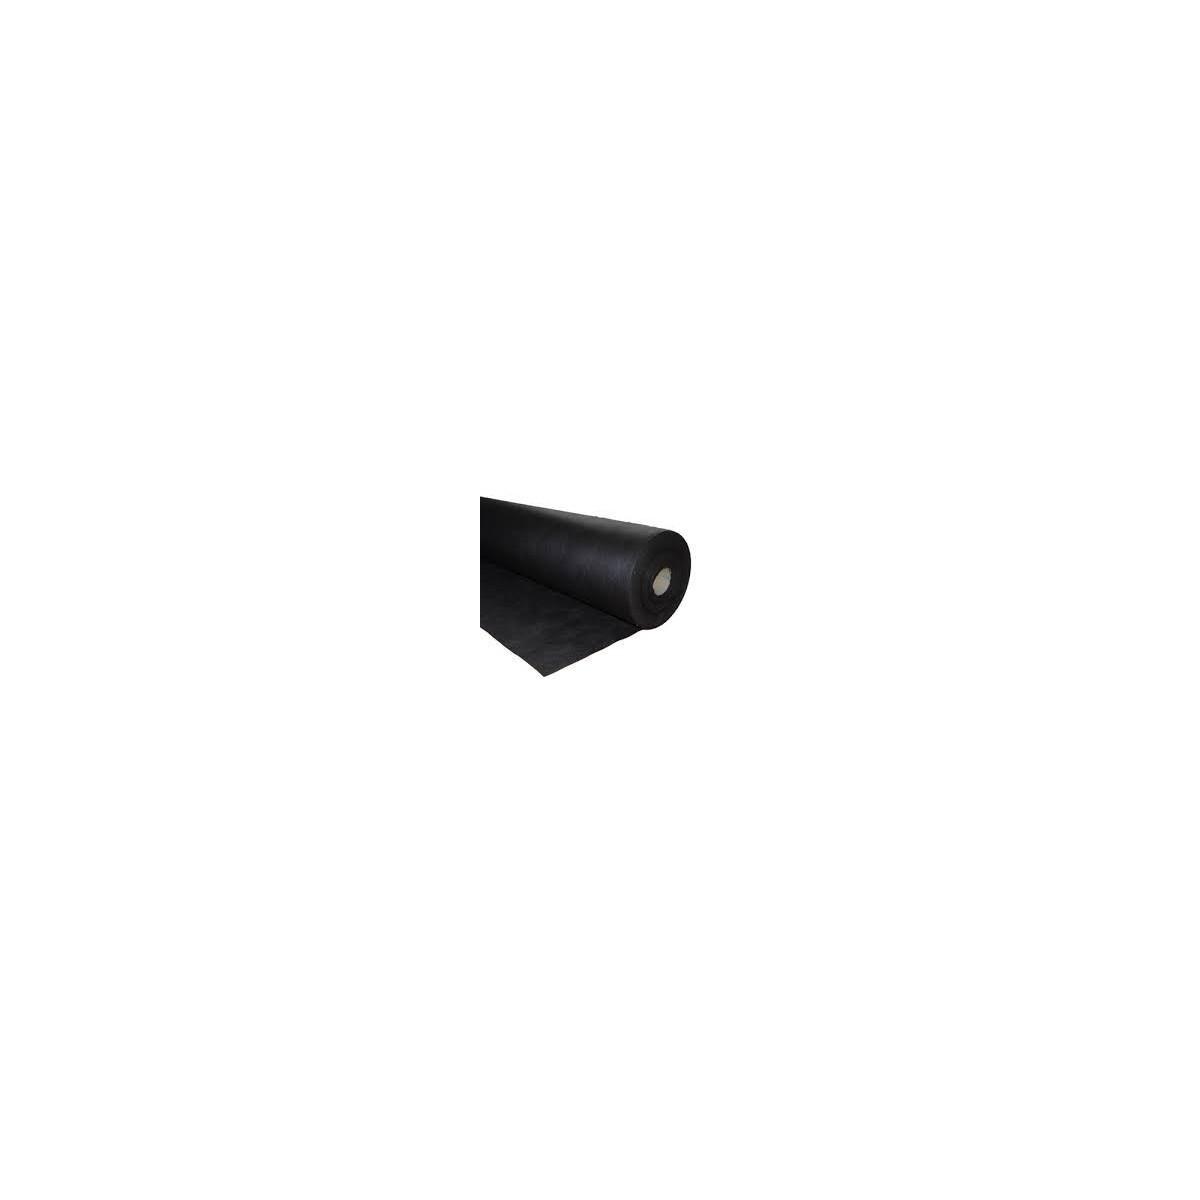 Agrowłóknina Czarna ściółkująca UV P-50 3,2x100mb - Domek Ogrodnika